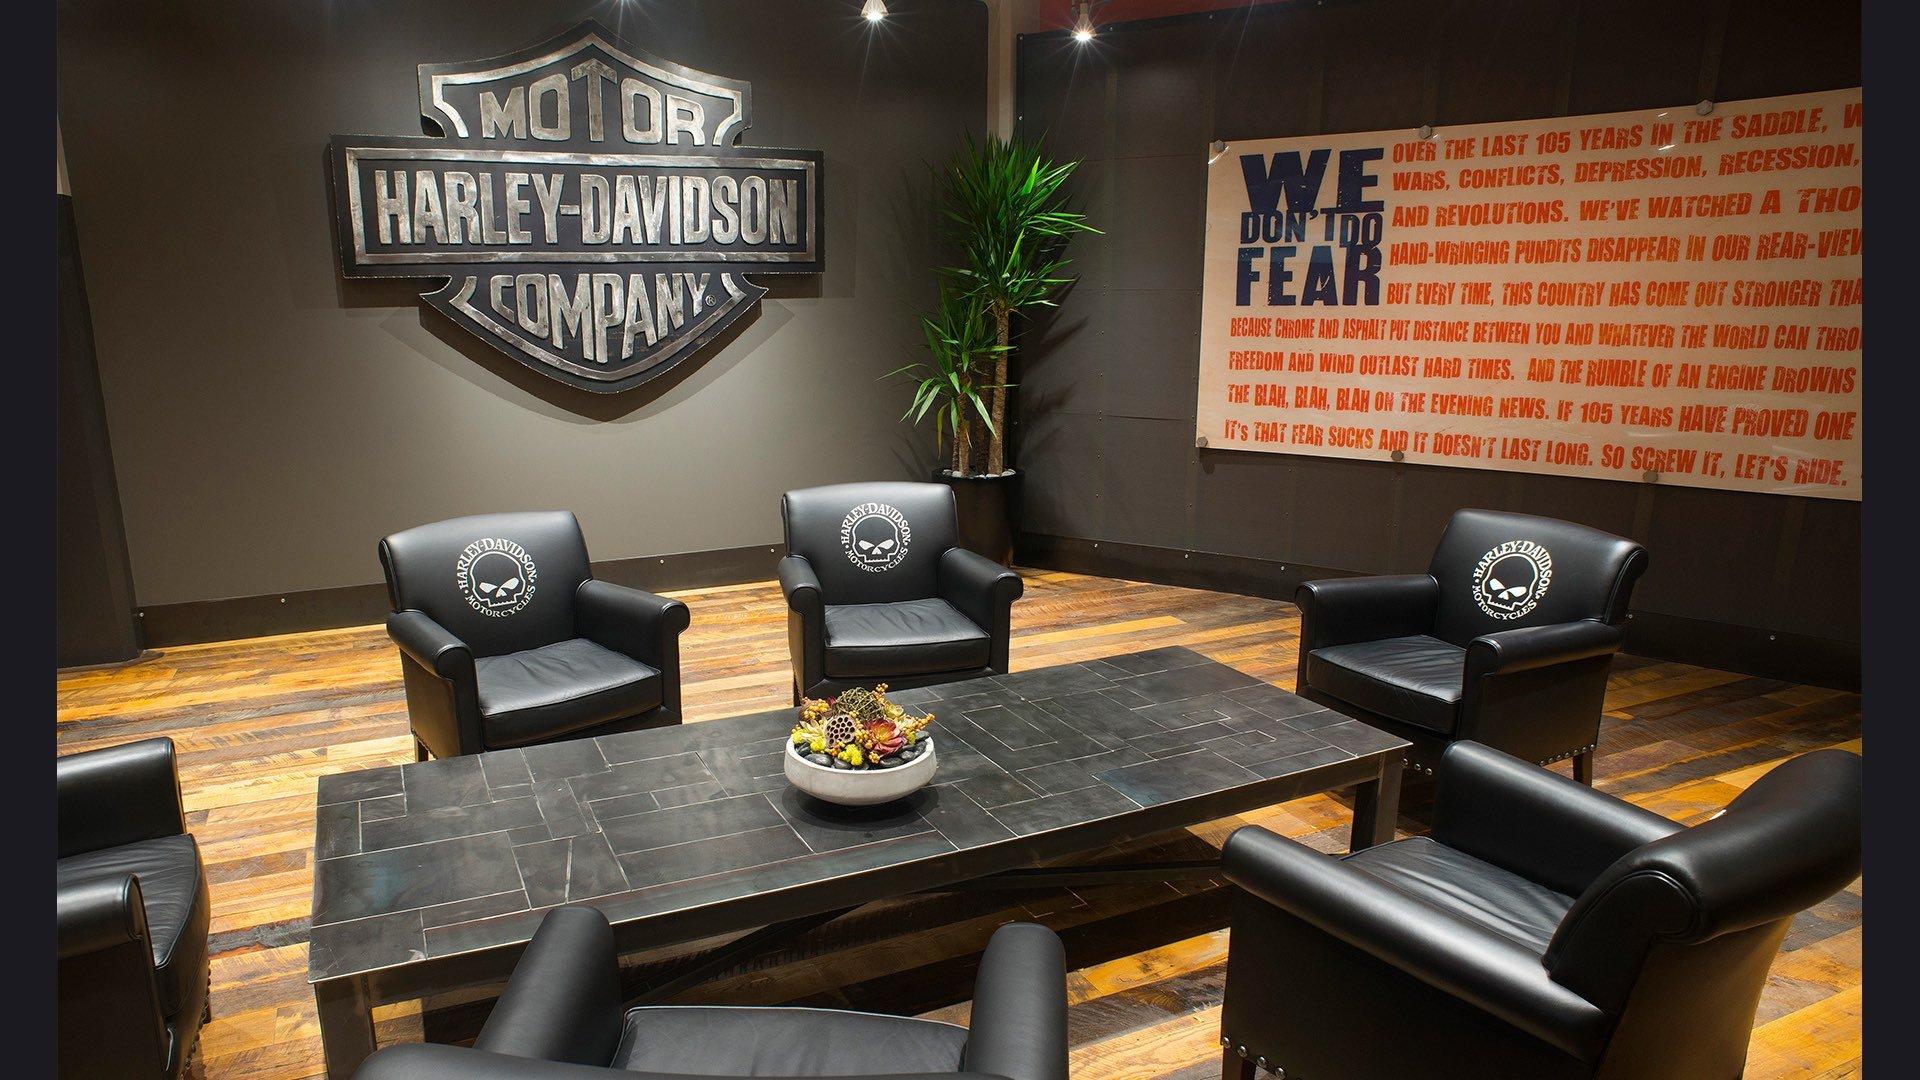 Harley Davidson Living Room Decor Ideas from i1.wp.com